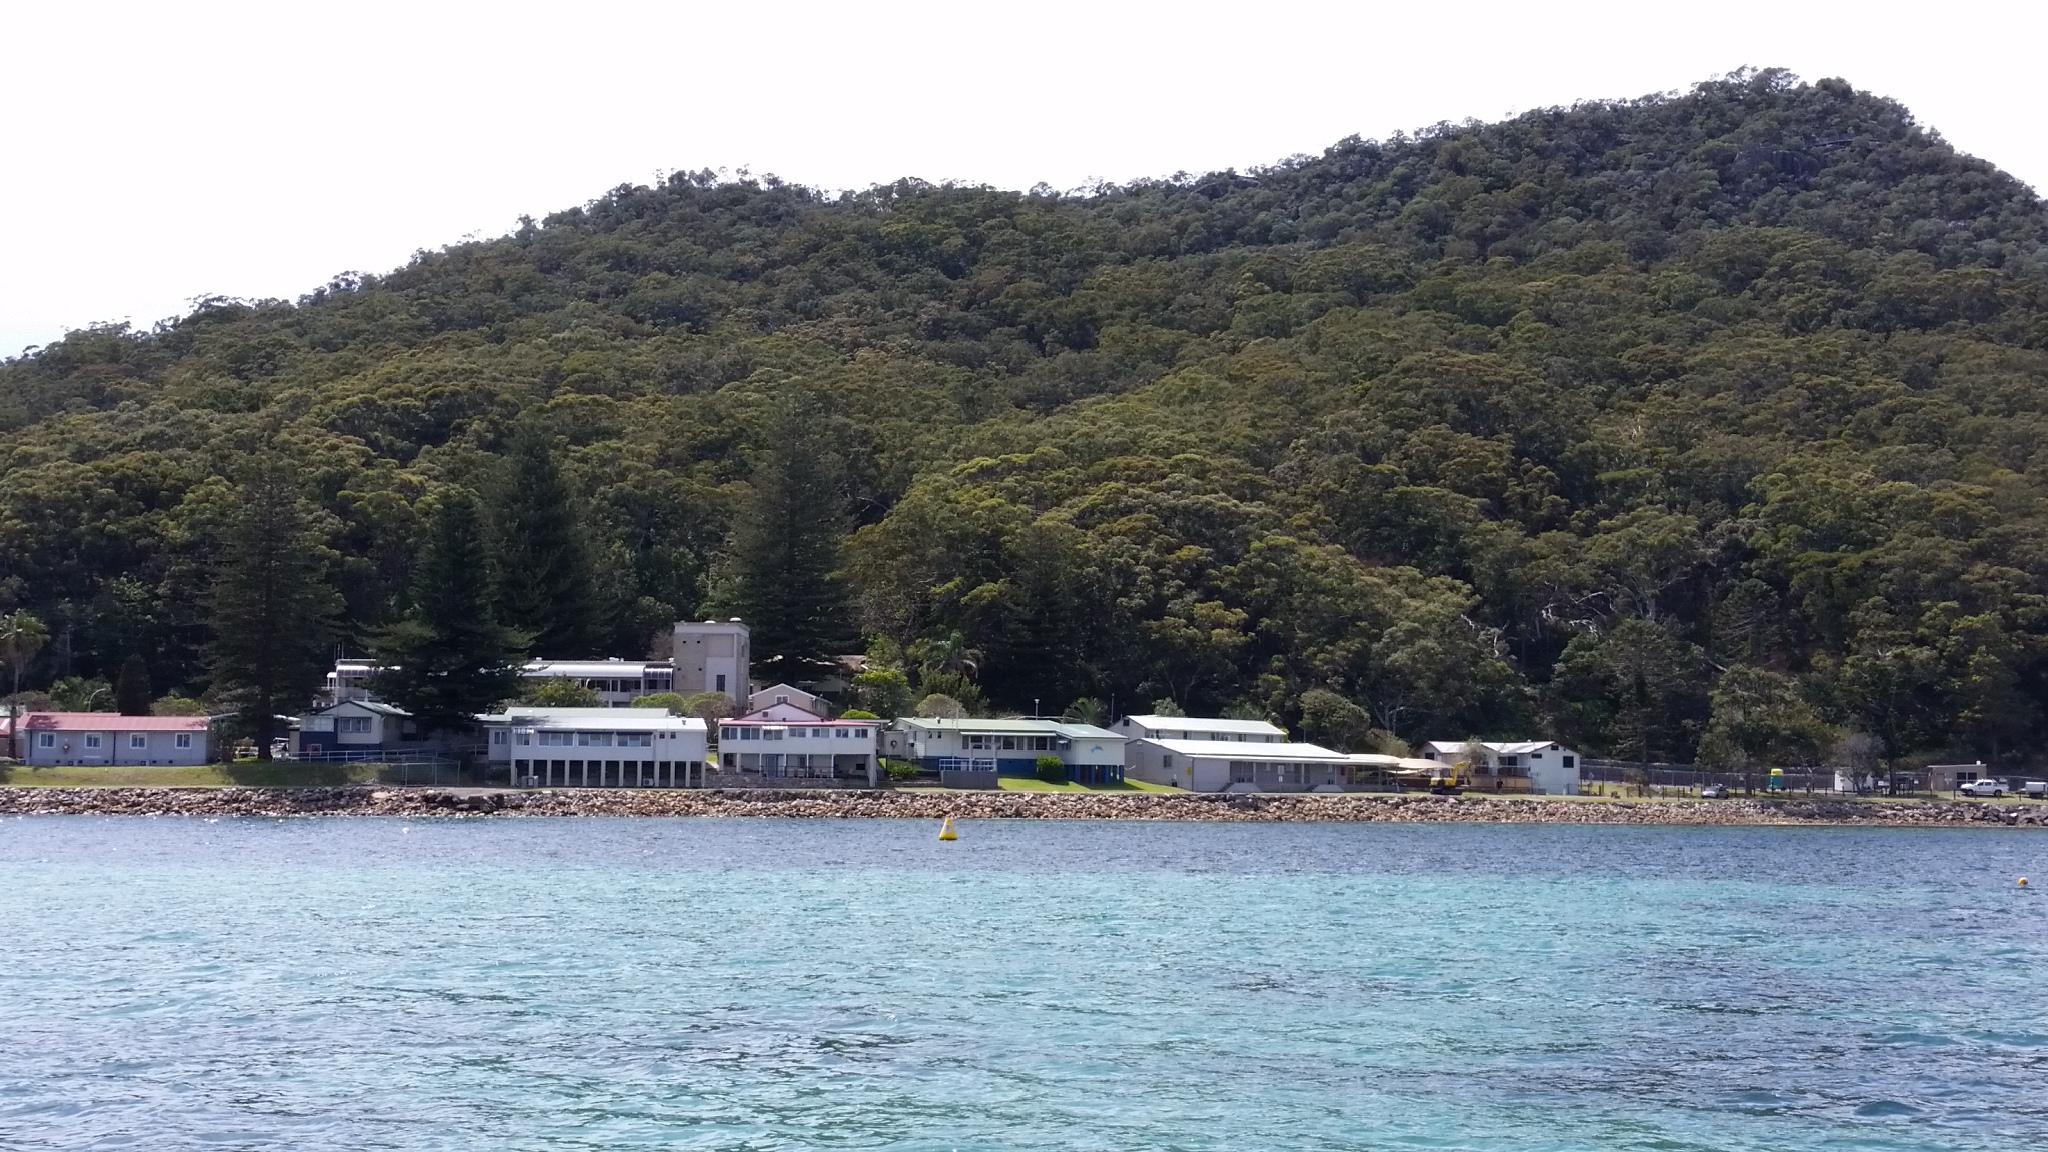 Tomaree Lodge